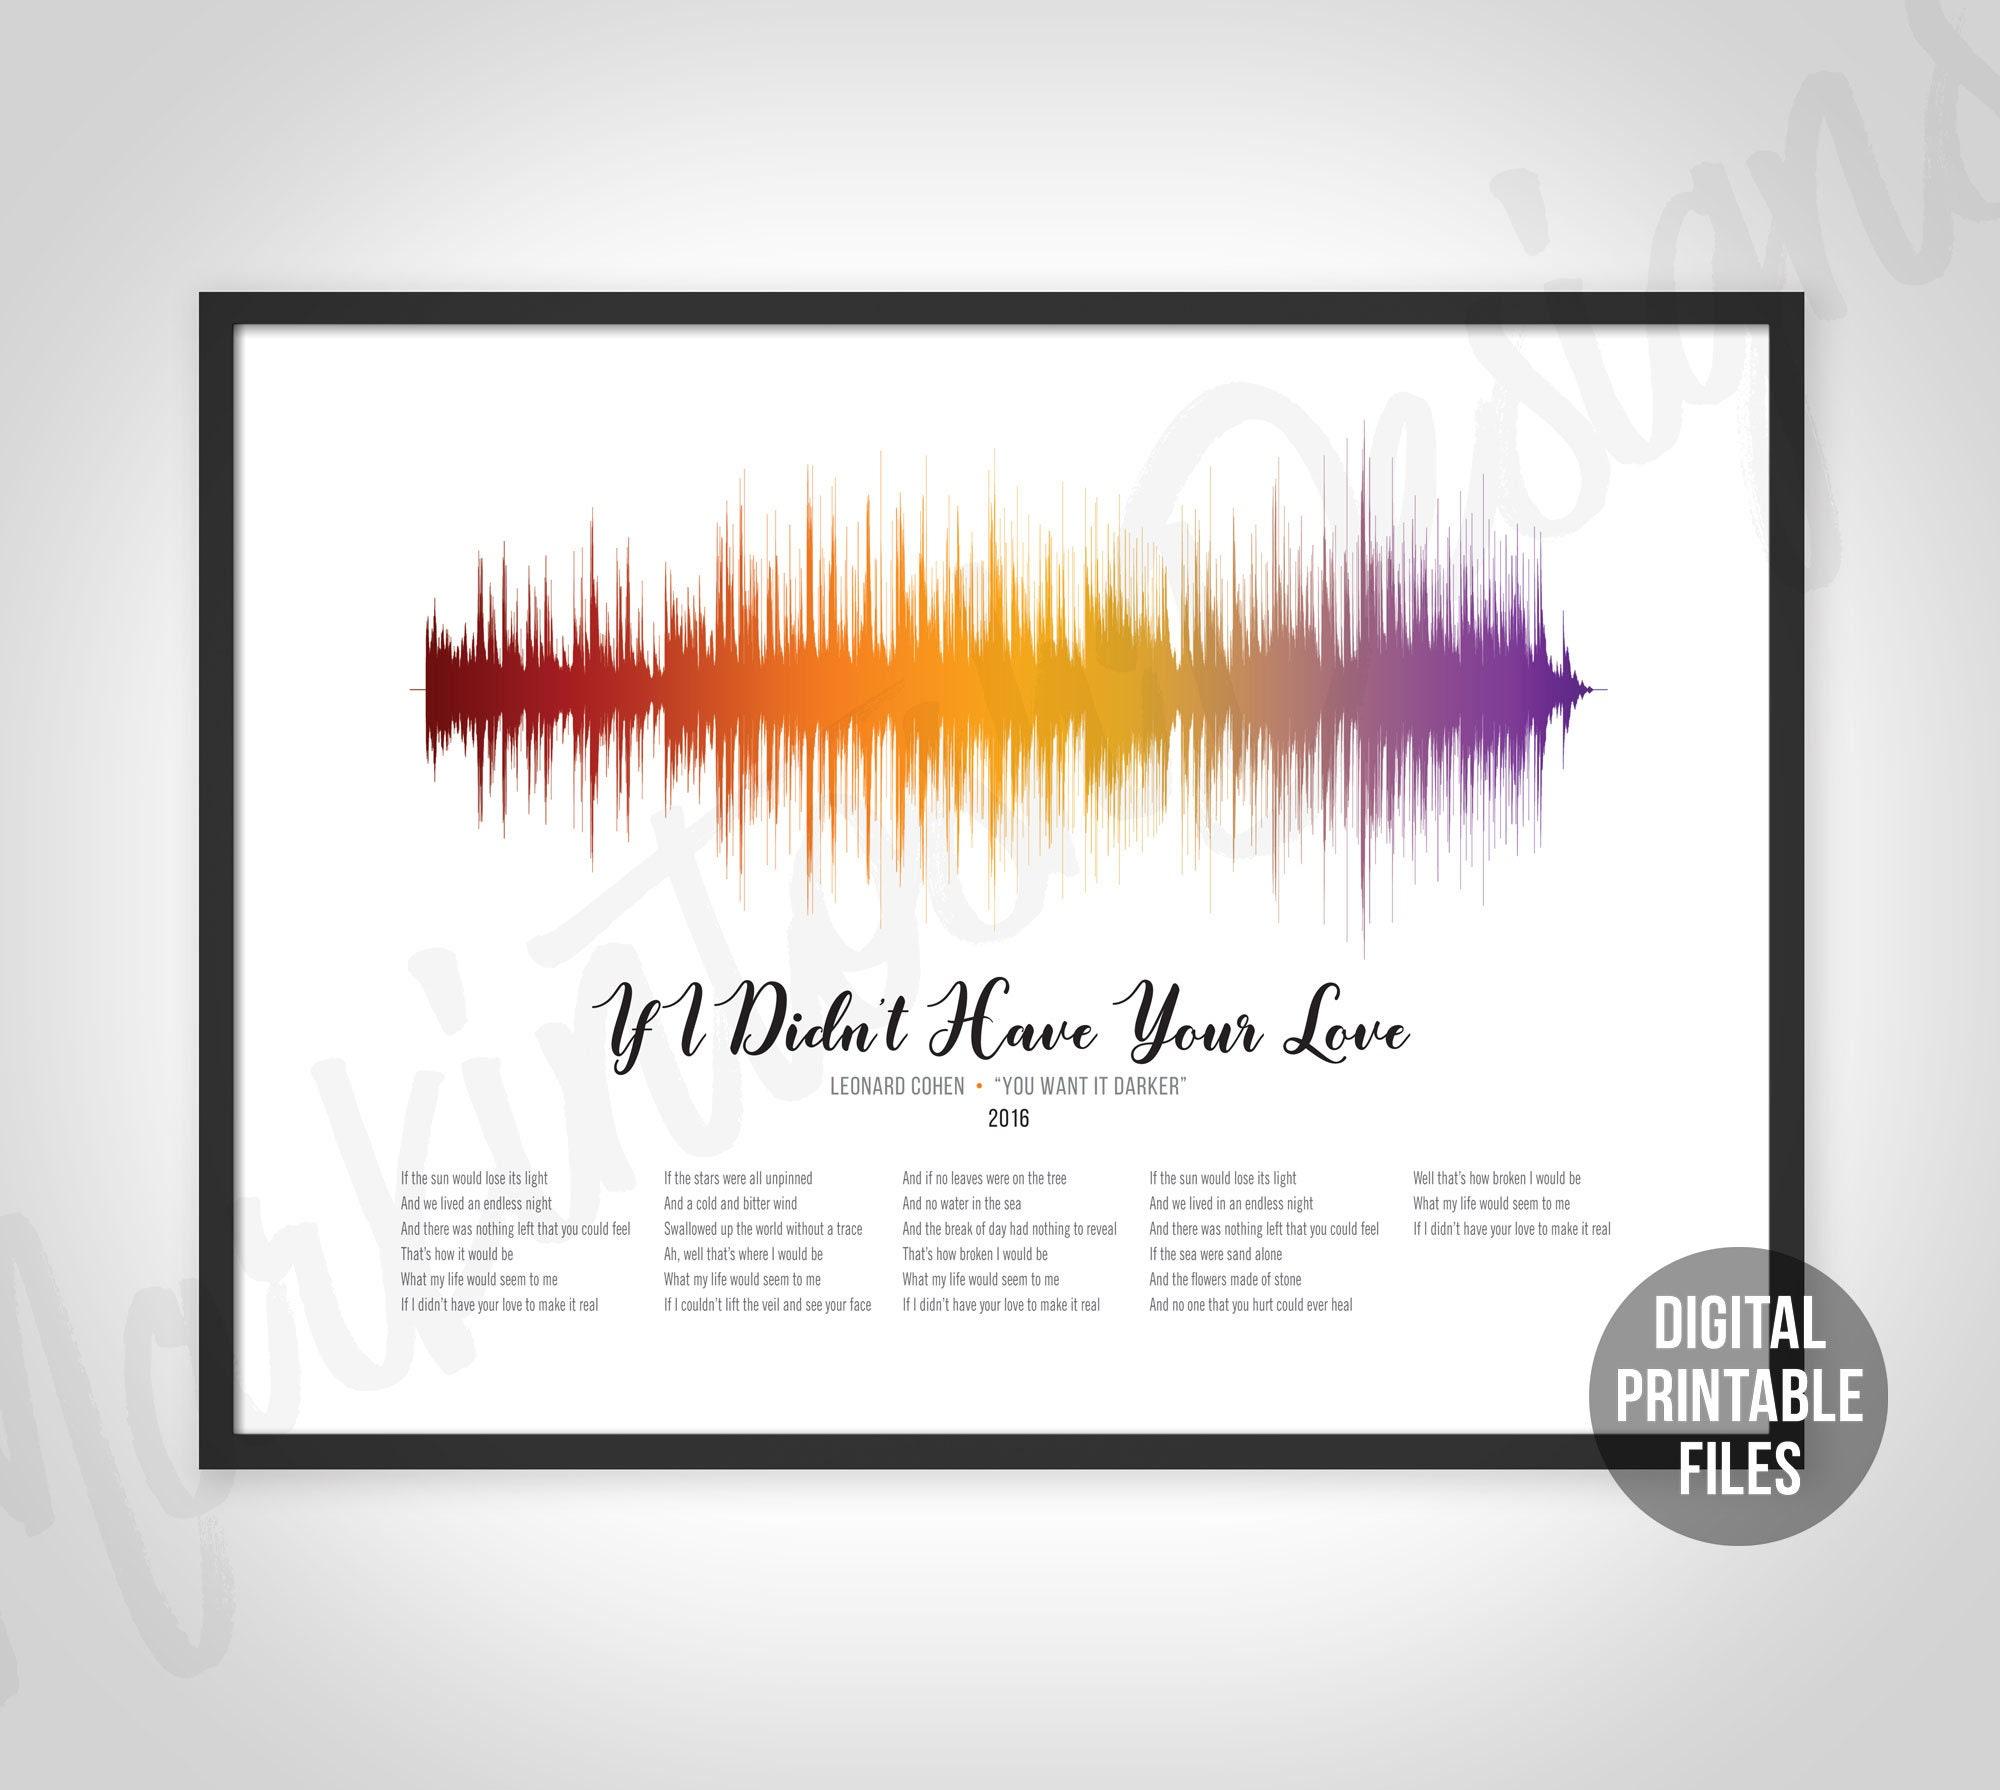 If I Didn't Have Your Love, Custom Sound Wave Lyrics art, Printable  digital, Instant download, Customizable soundwave gift